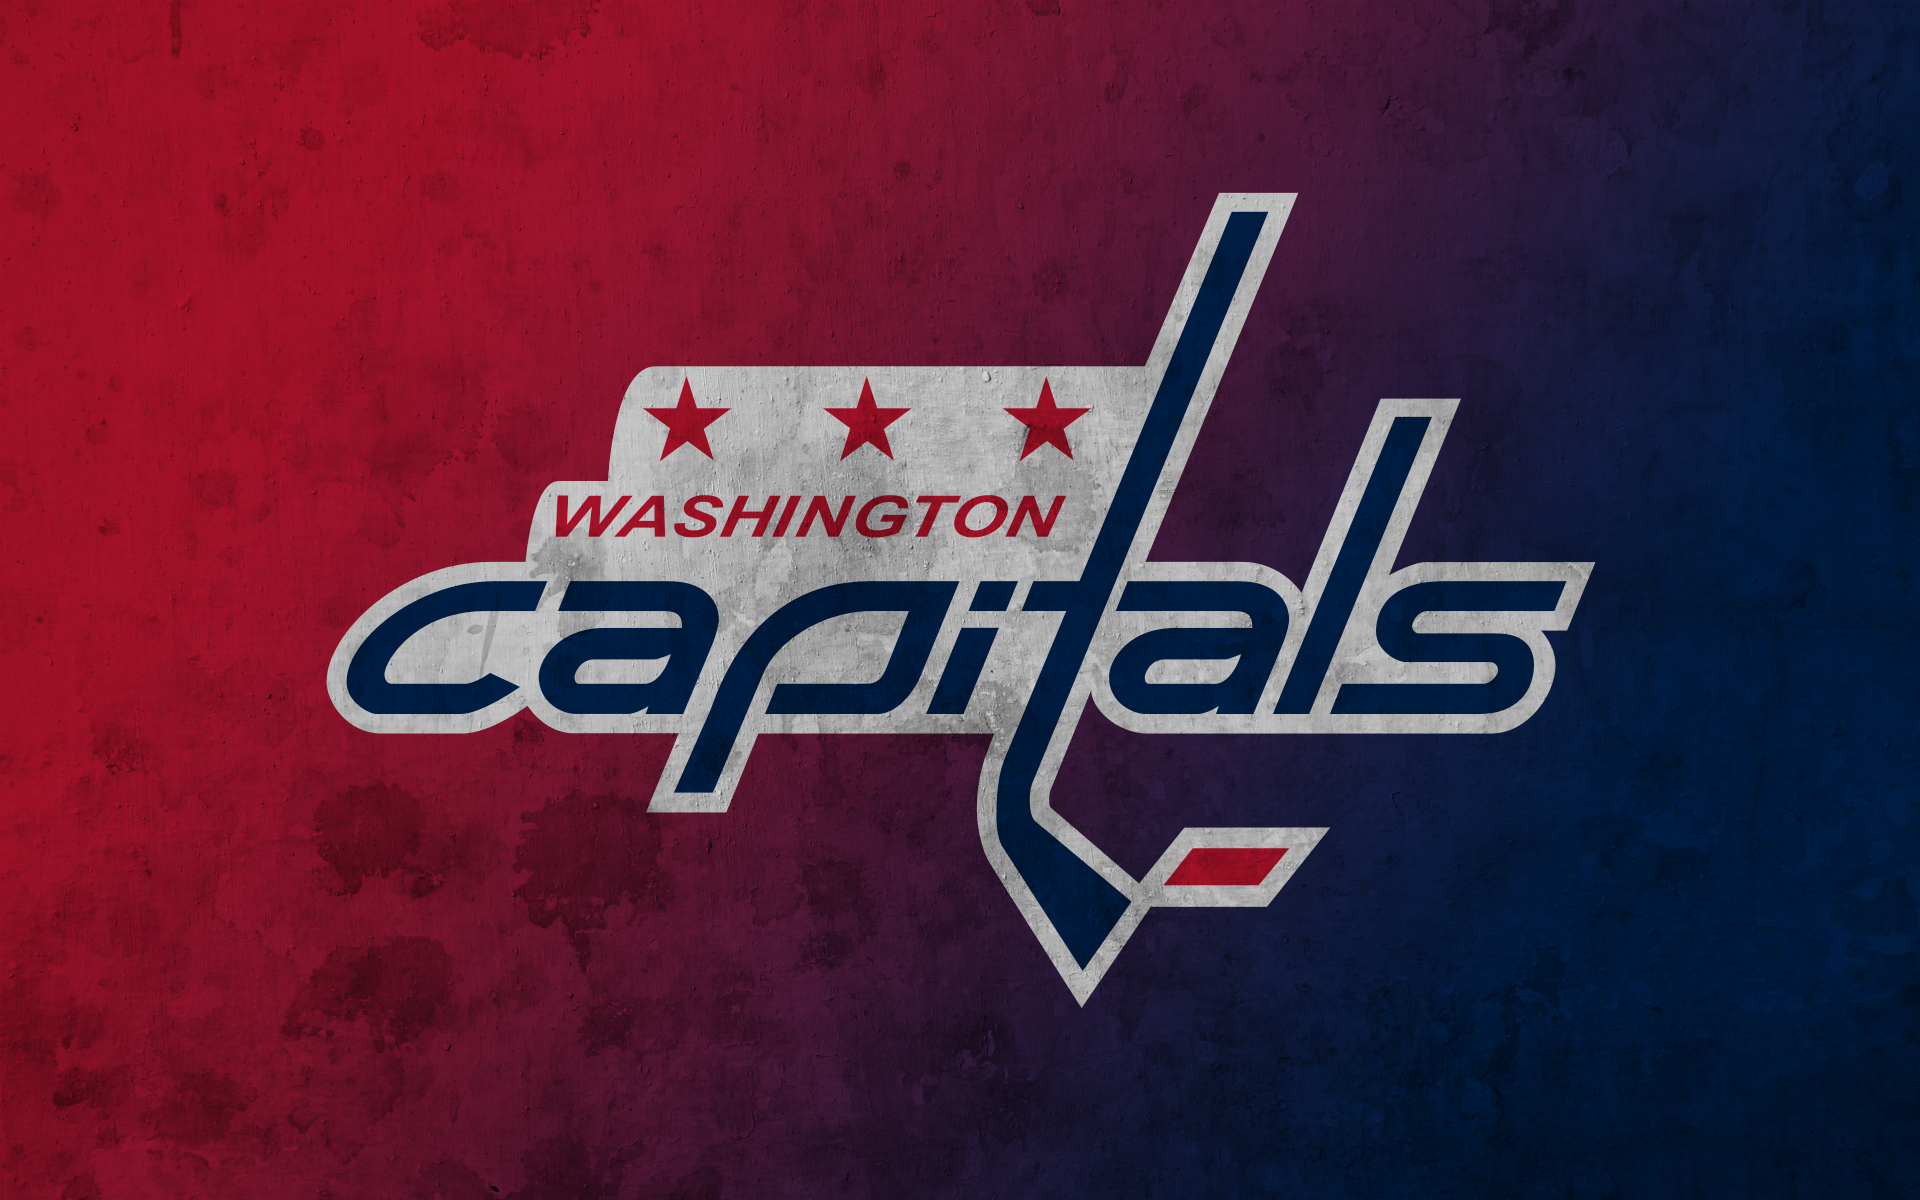 Download NHL Team Desktop Wallpapers Discount Hockey [1920x1200 1920x1200